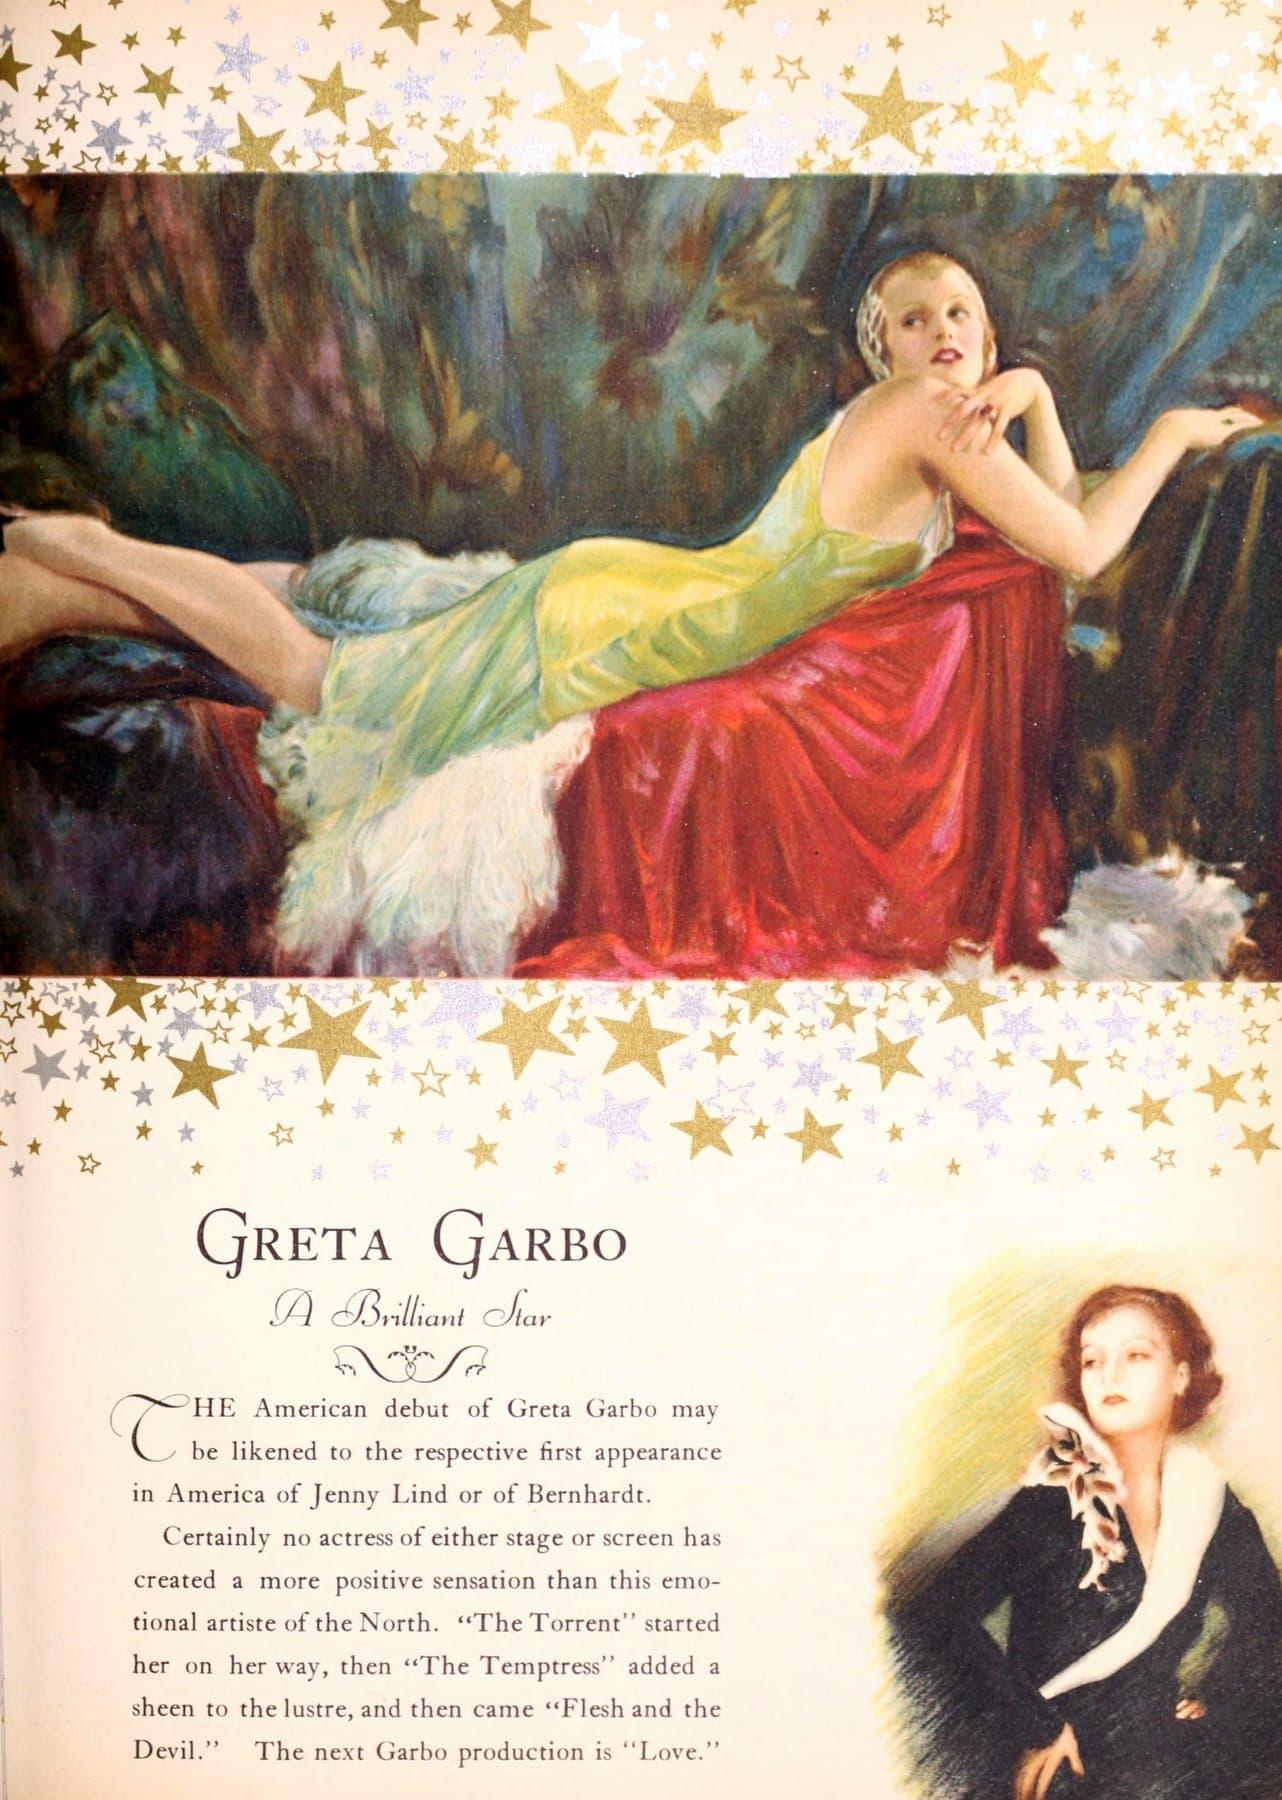 Greta Garbo - A brilliant star (1927)